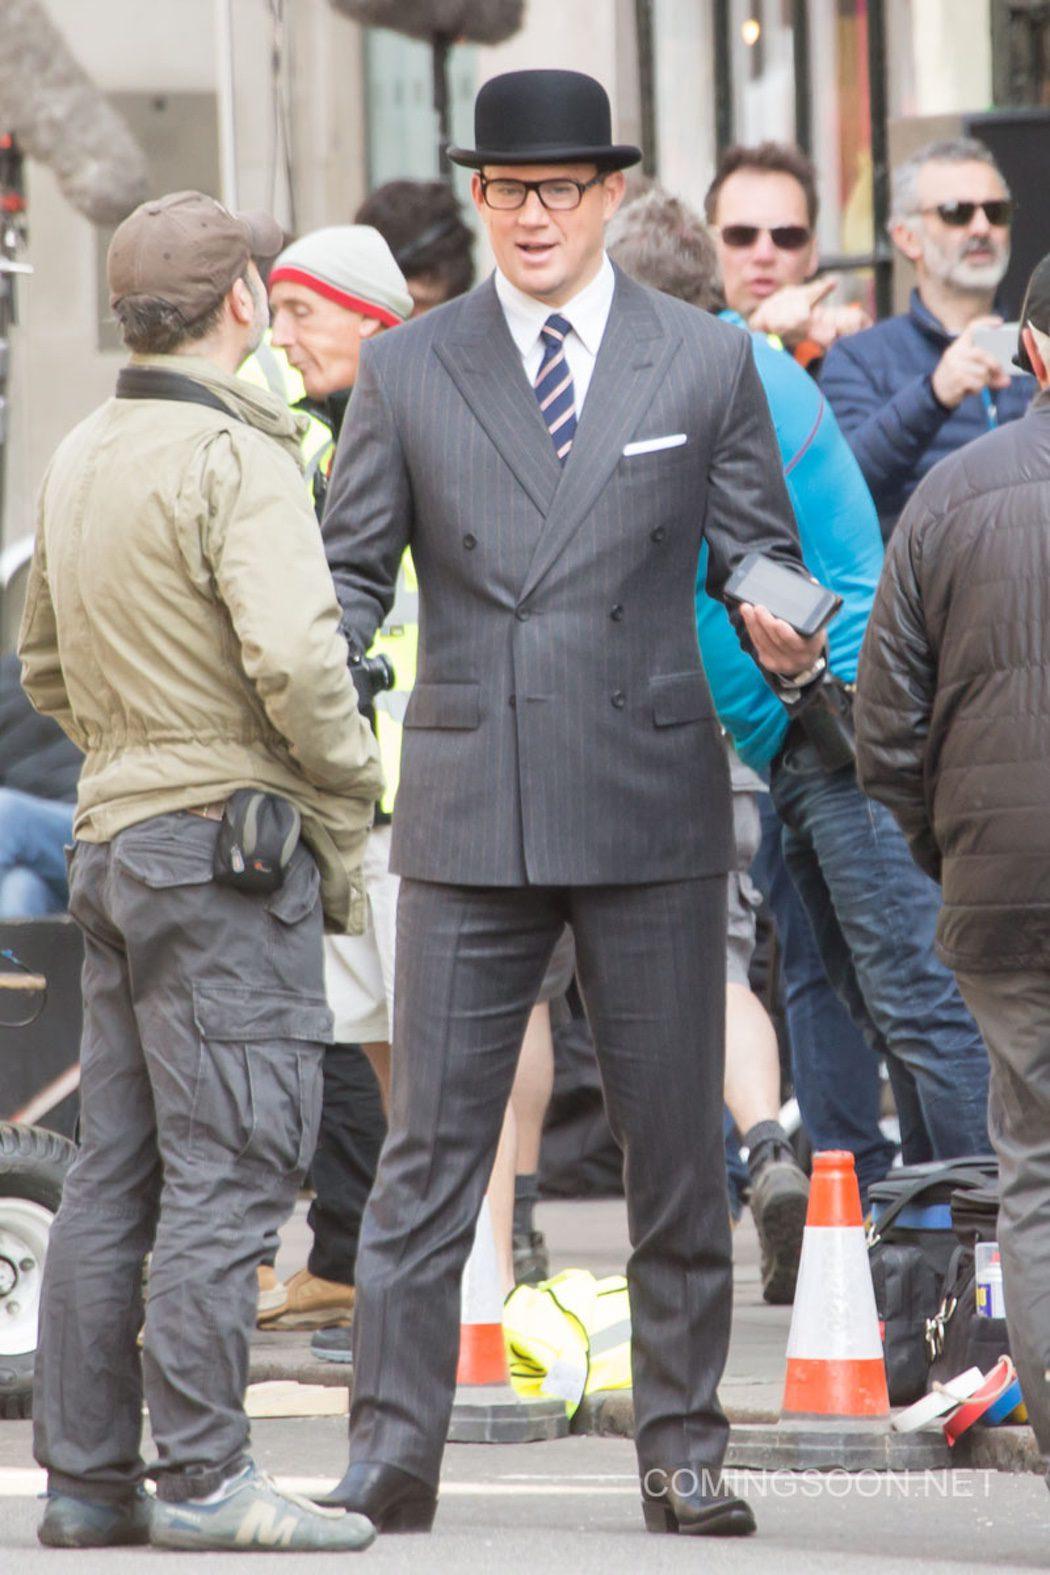 Channing Tatum durante el rodaje de 'Kingsman: The Golden Circle'